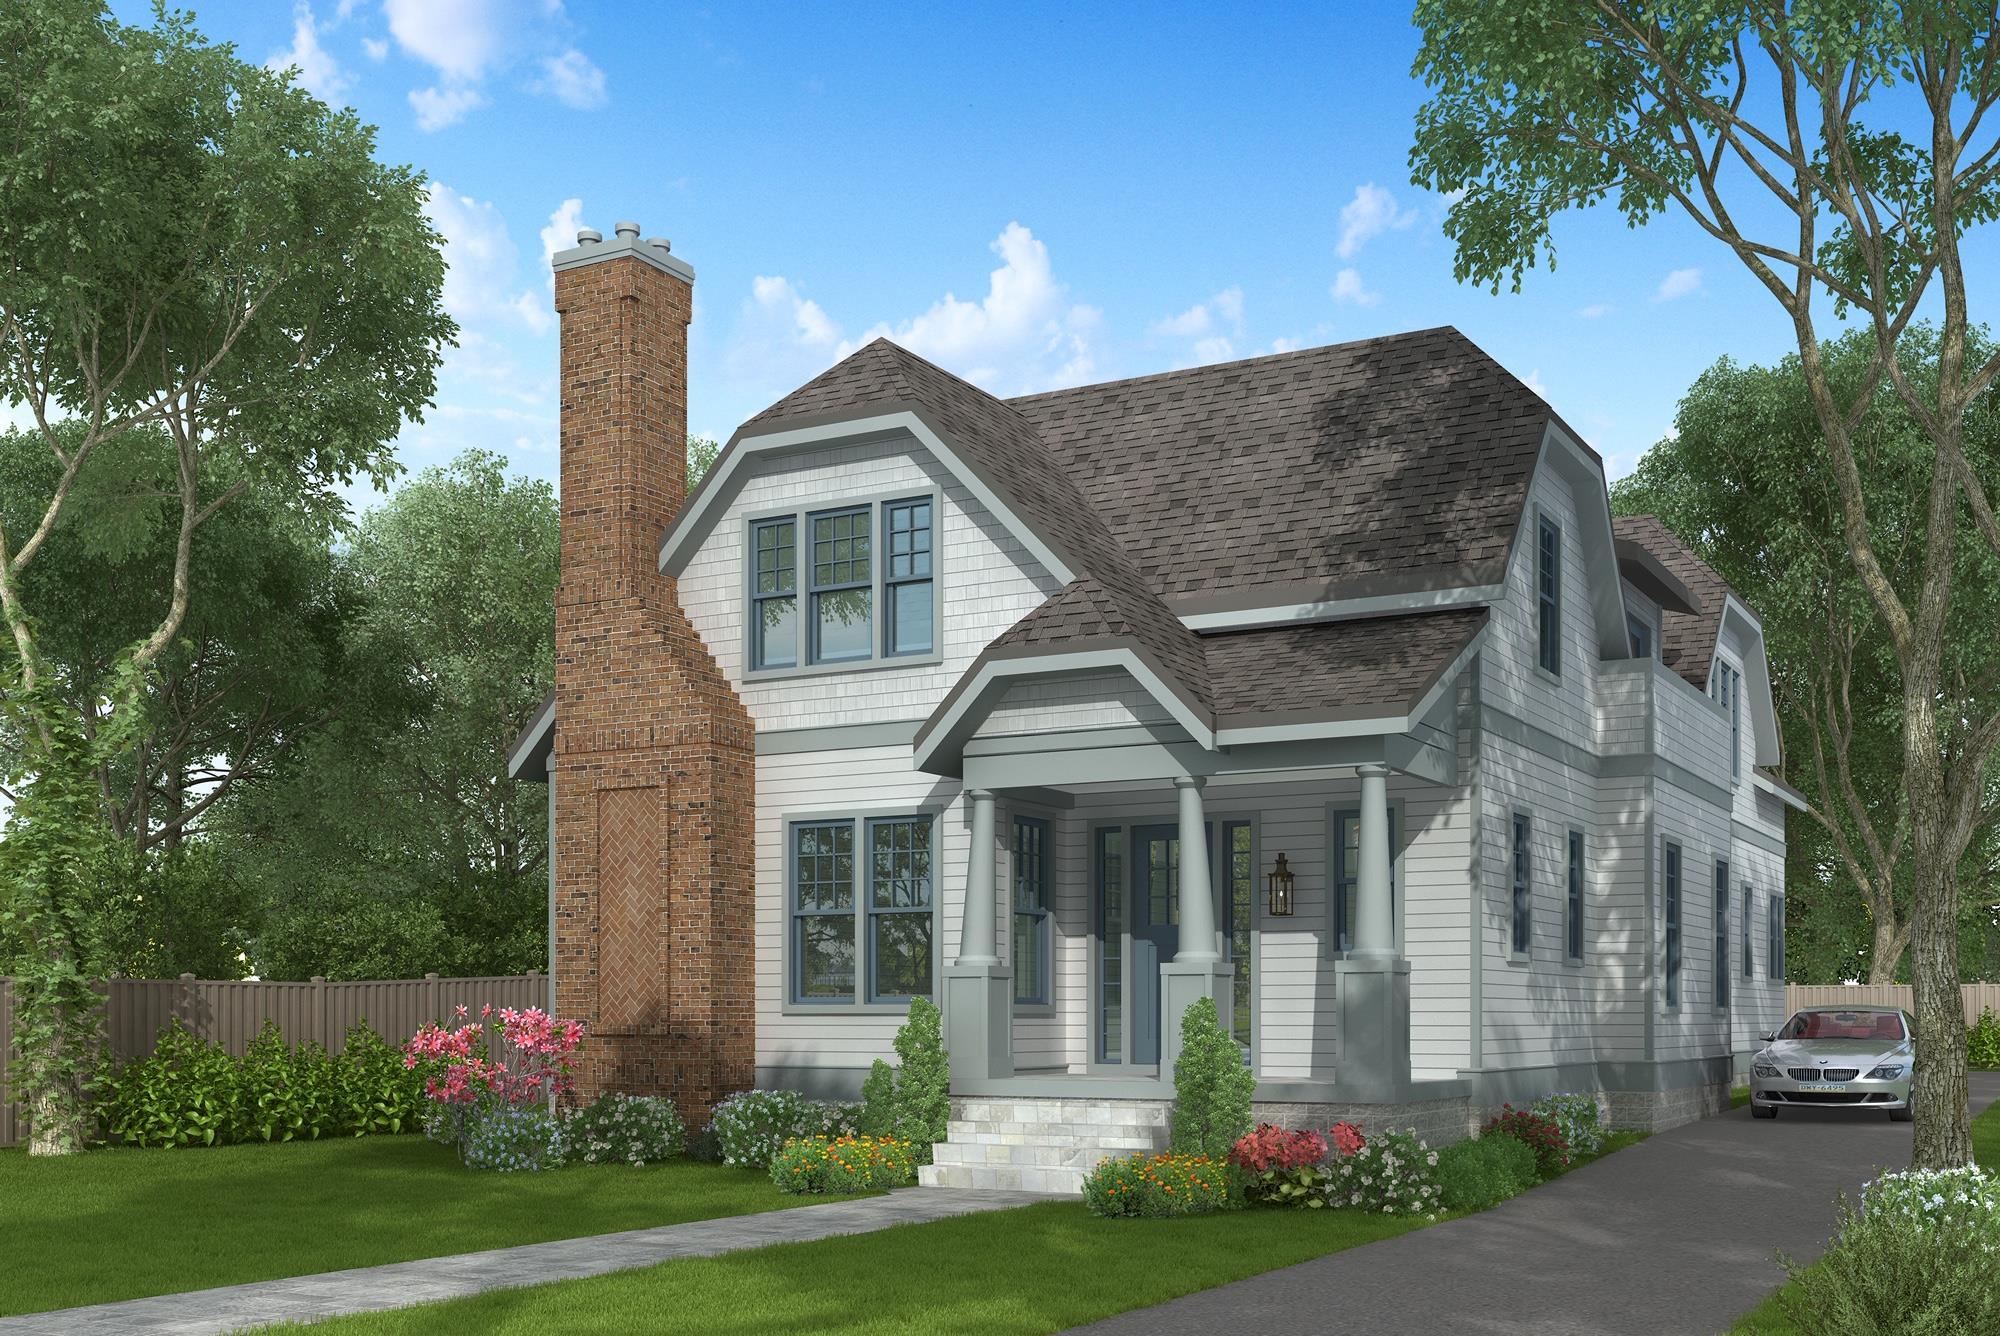 2137 Ashwood Ave, Nashville, TN 37212 - Nashville, TN real estate listing